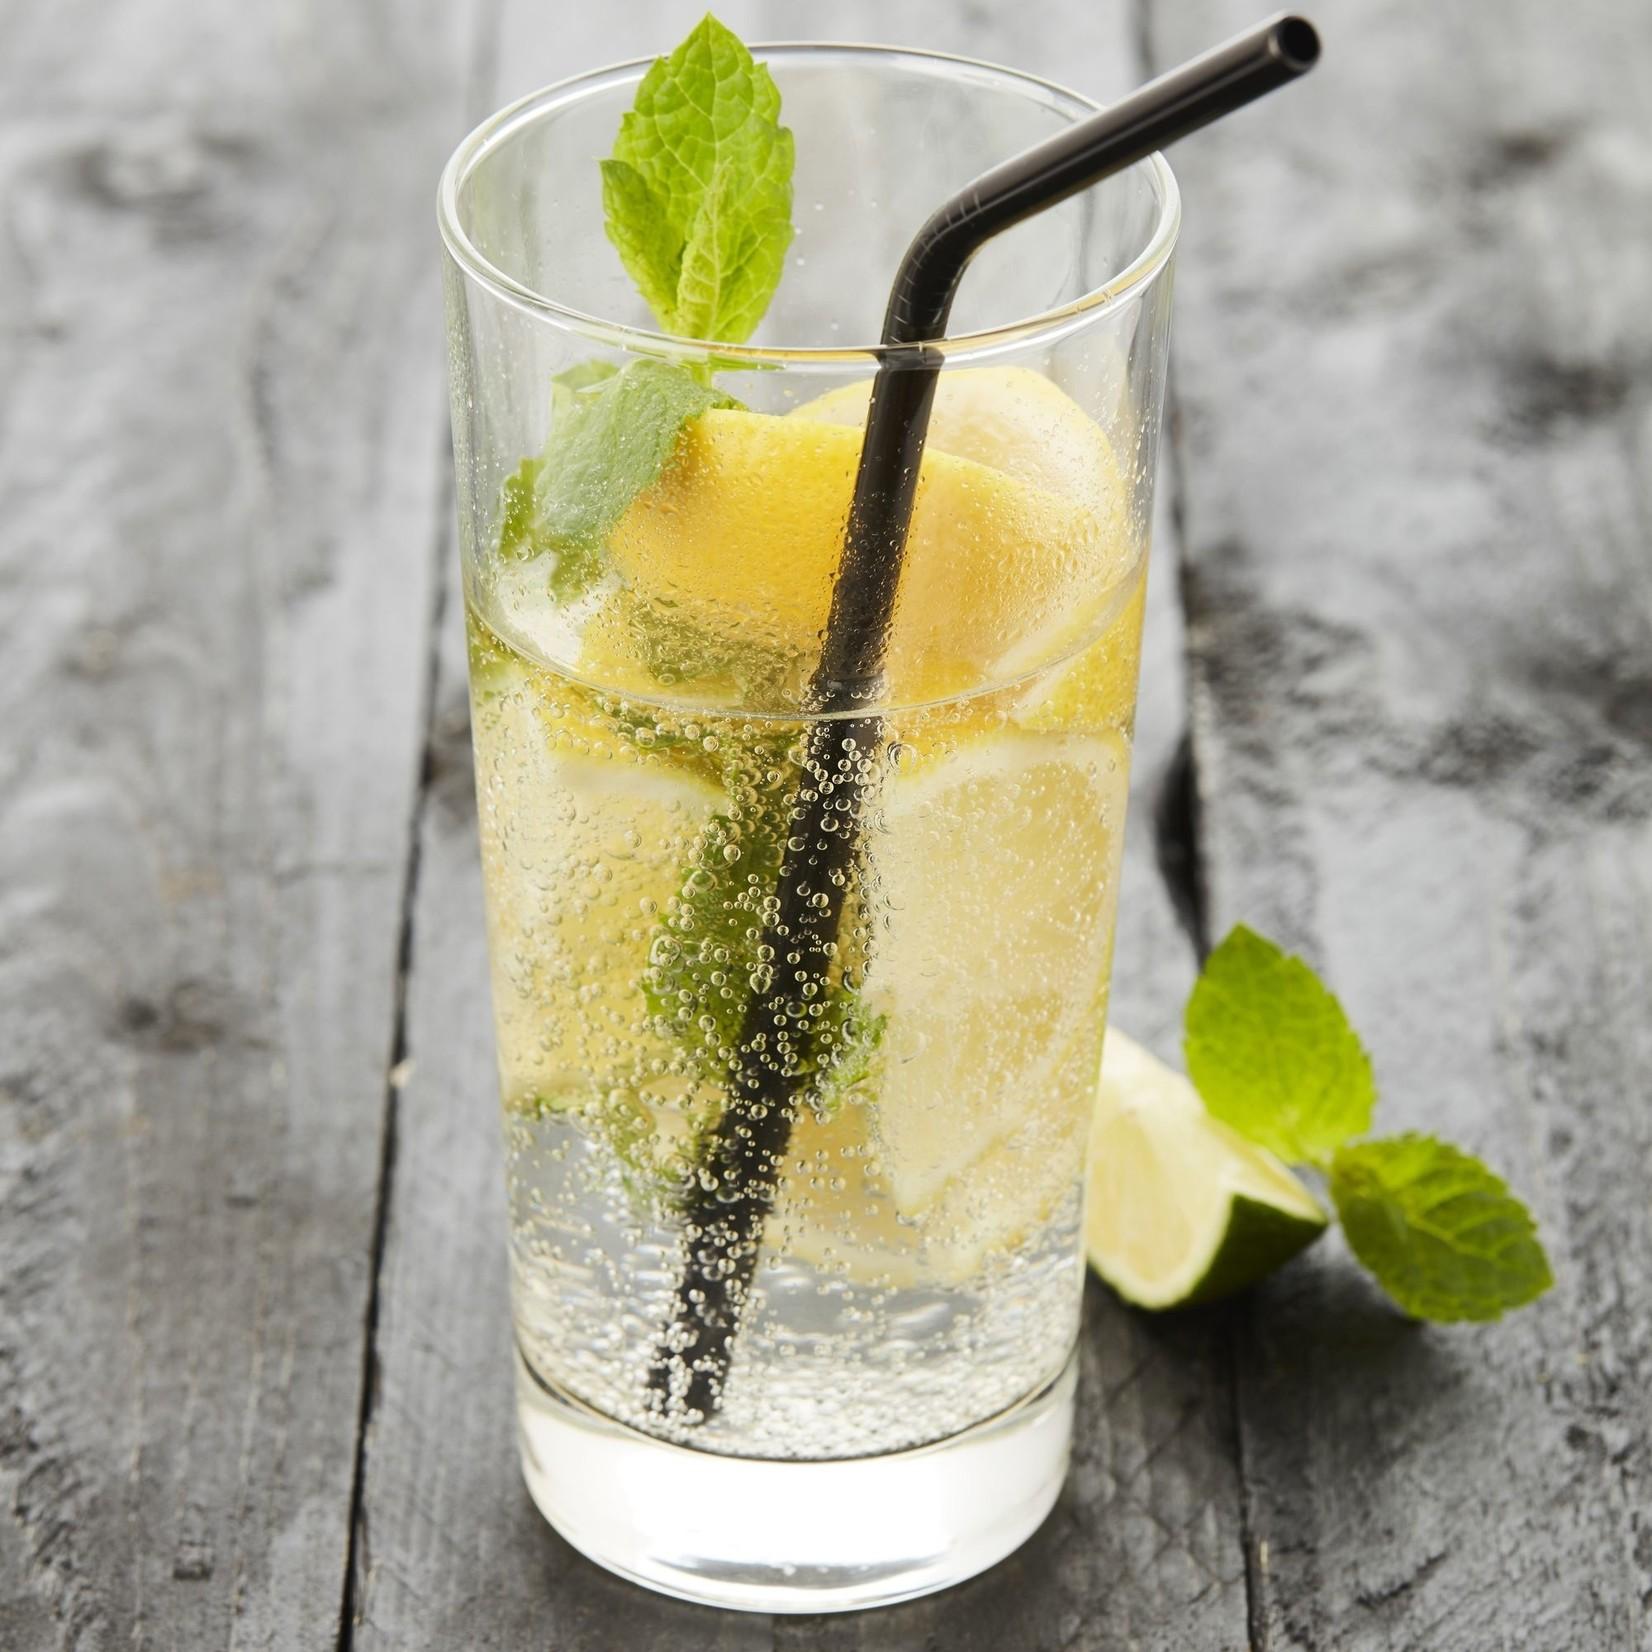 Cocktail rietjes zwart - set van 4 - Point virgule